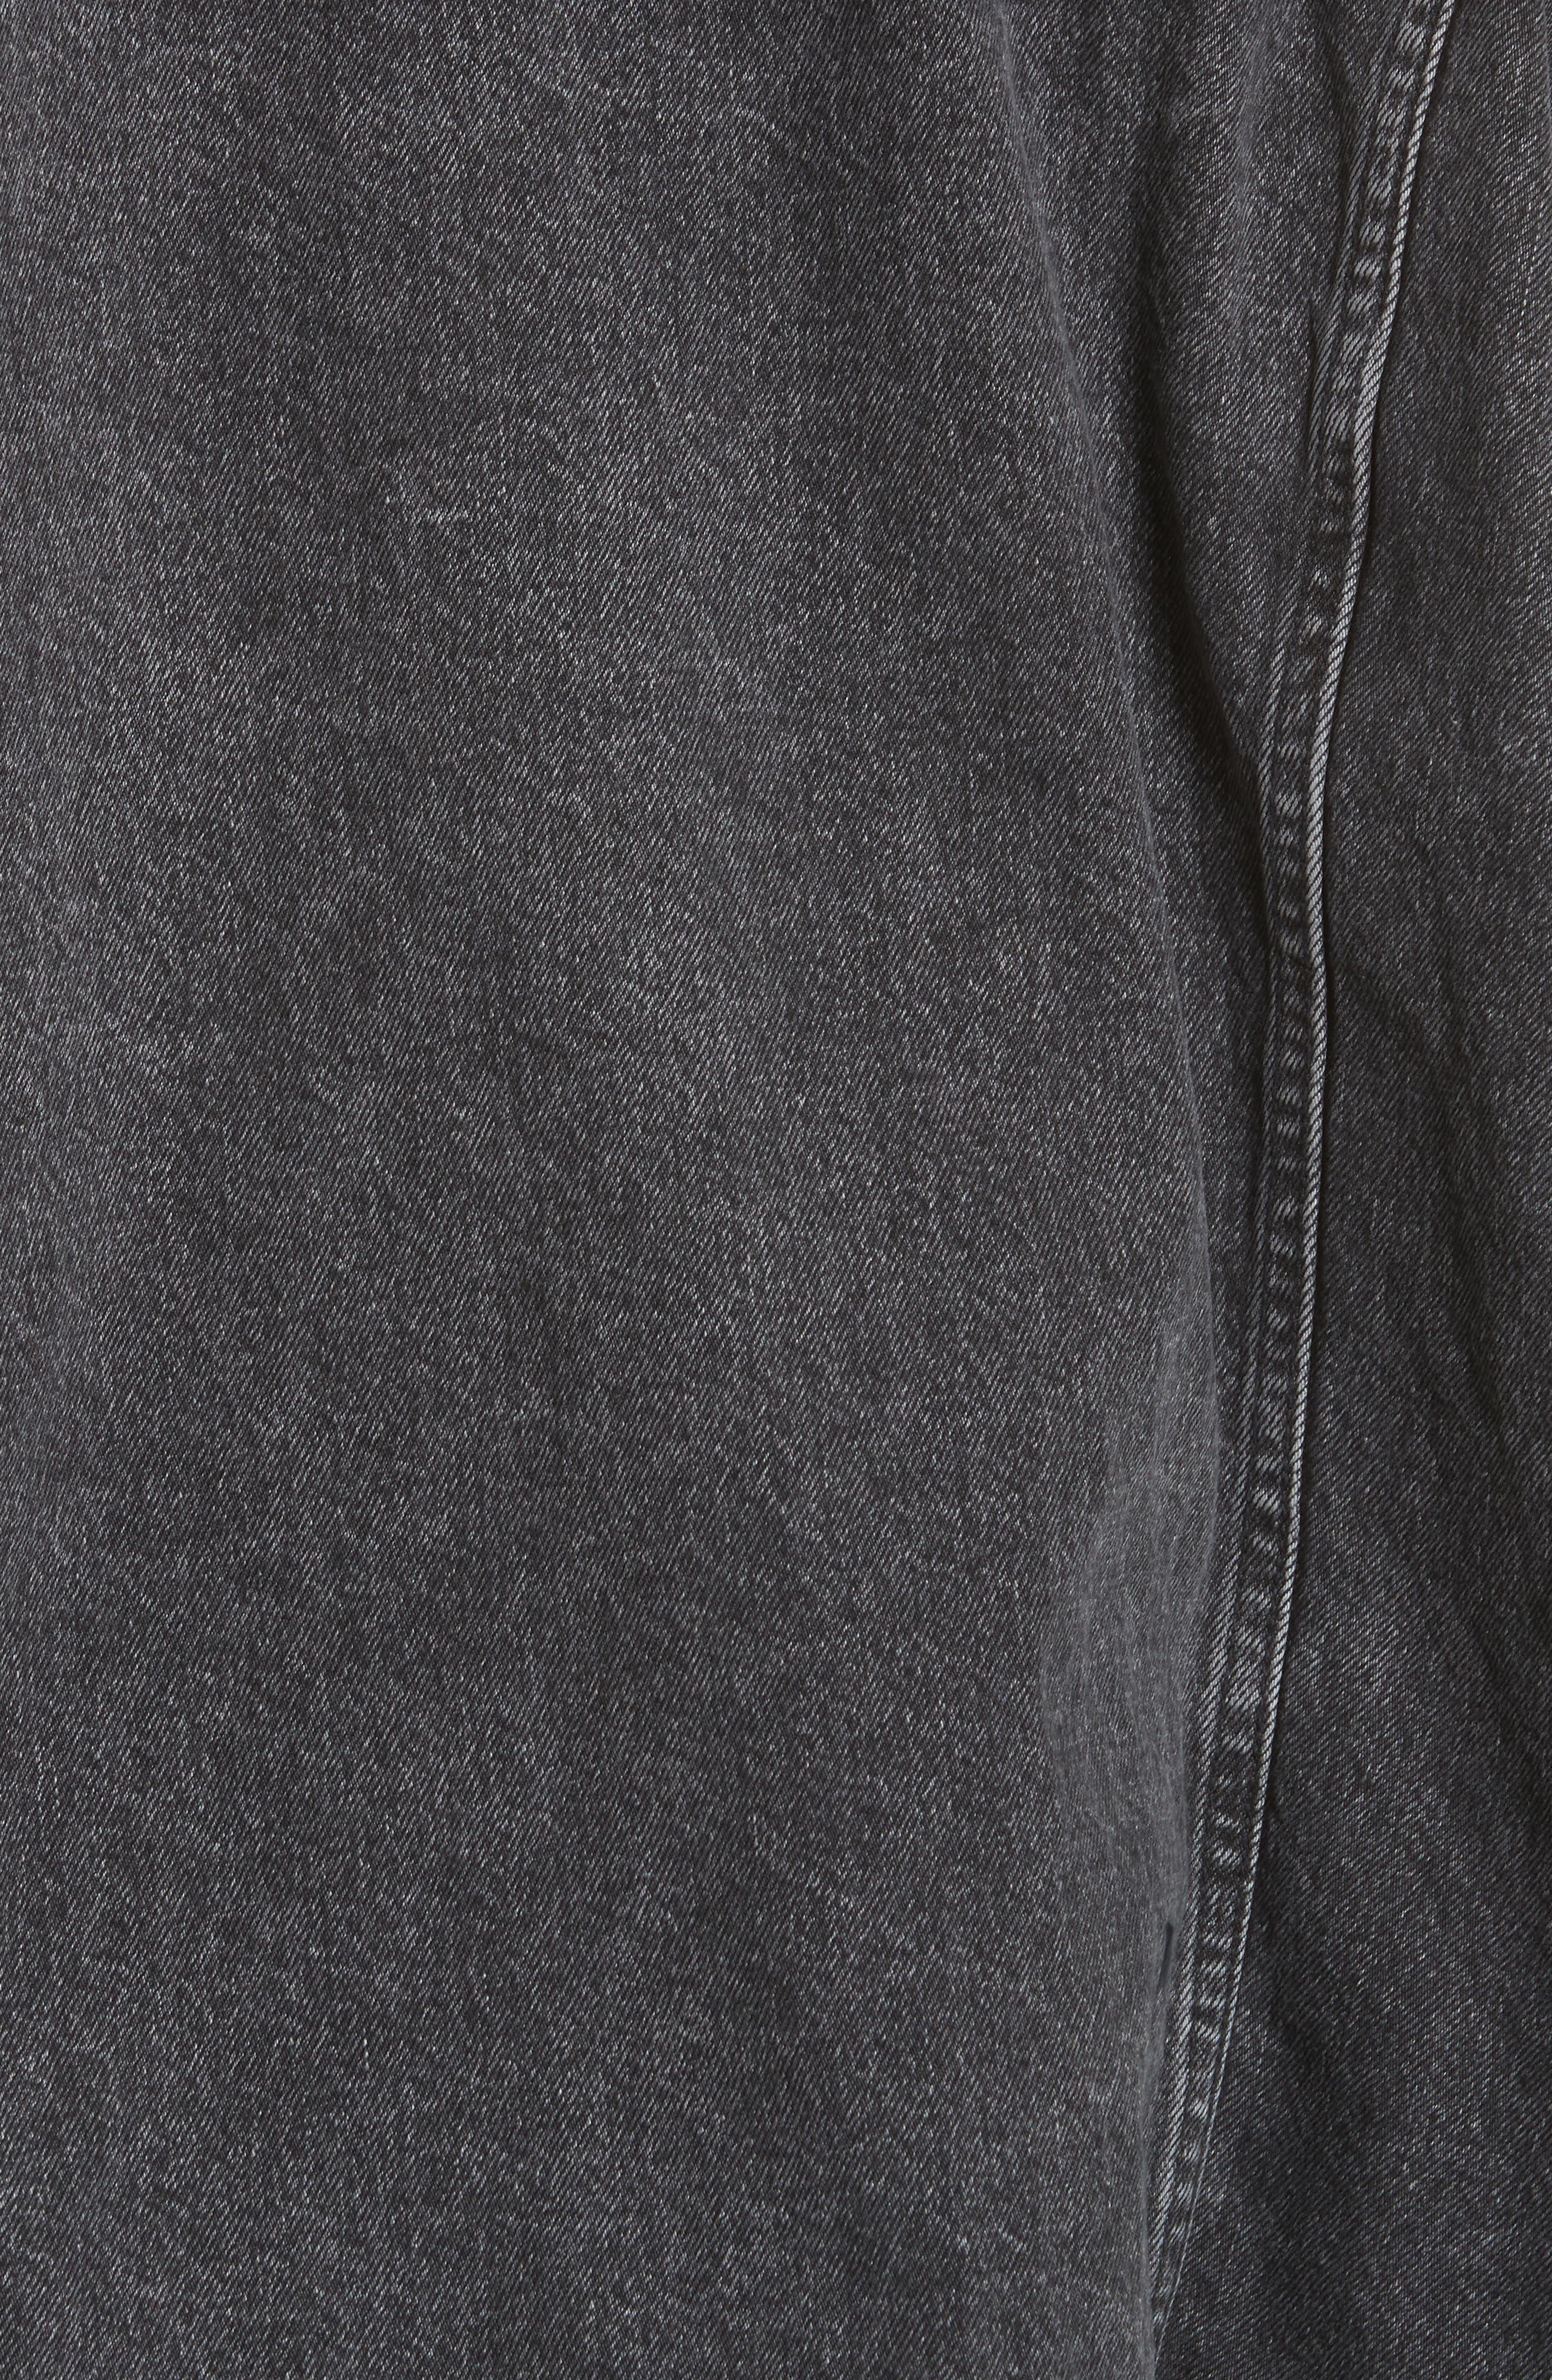 Oversized Removable Hood Denim Jacket,                             Alternate thumbnail 7, color,                             001